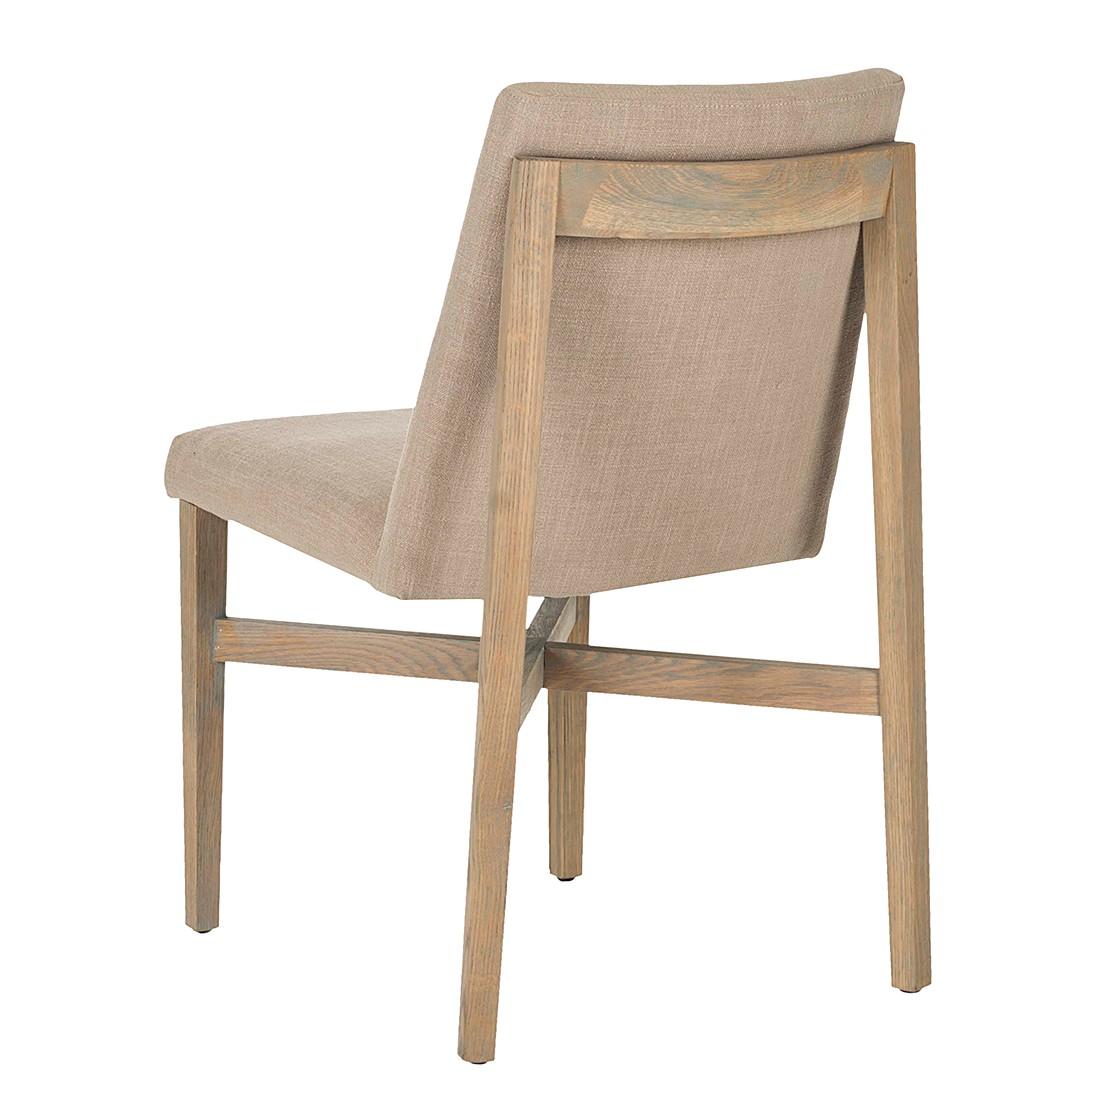 2x polsterstuhl laurent eiche esszimmerstuhl hochlehner. Black Bedroom Furniture Sets. Home Design Ideas